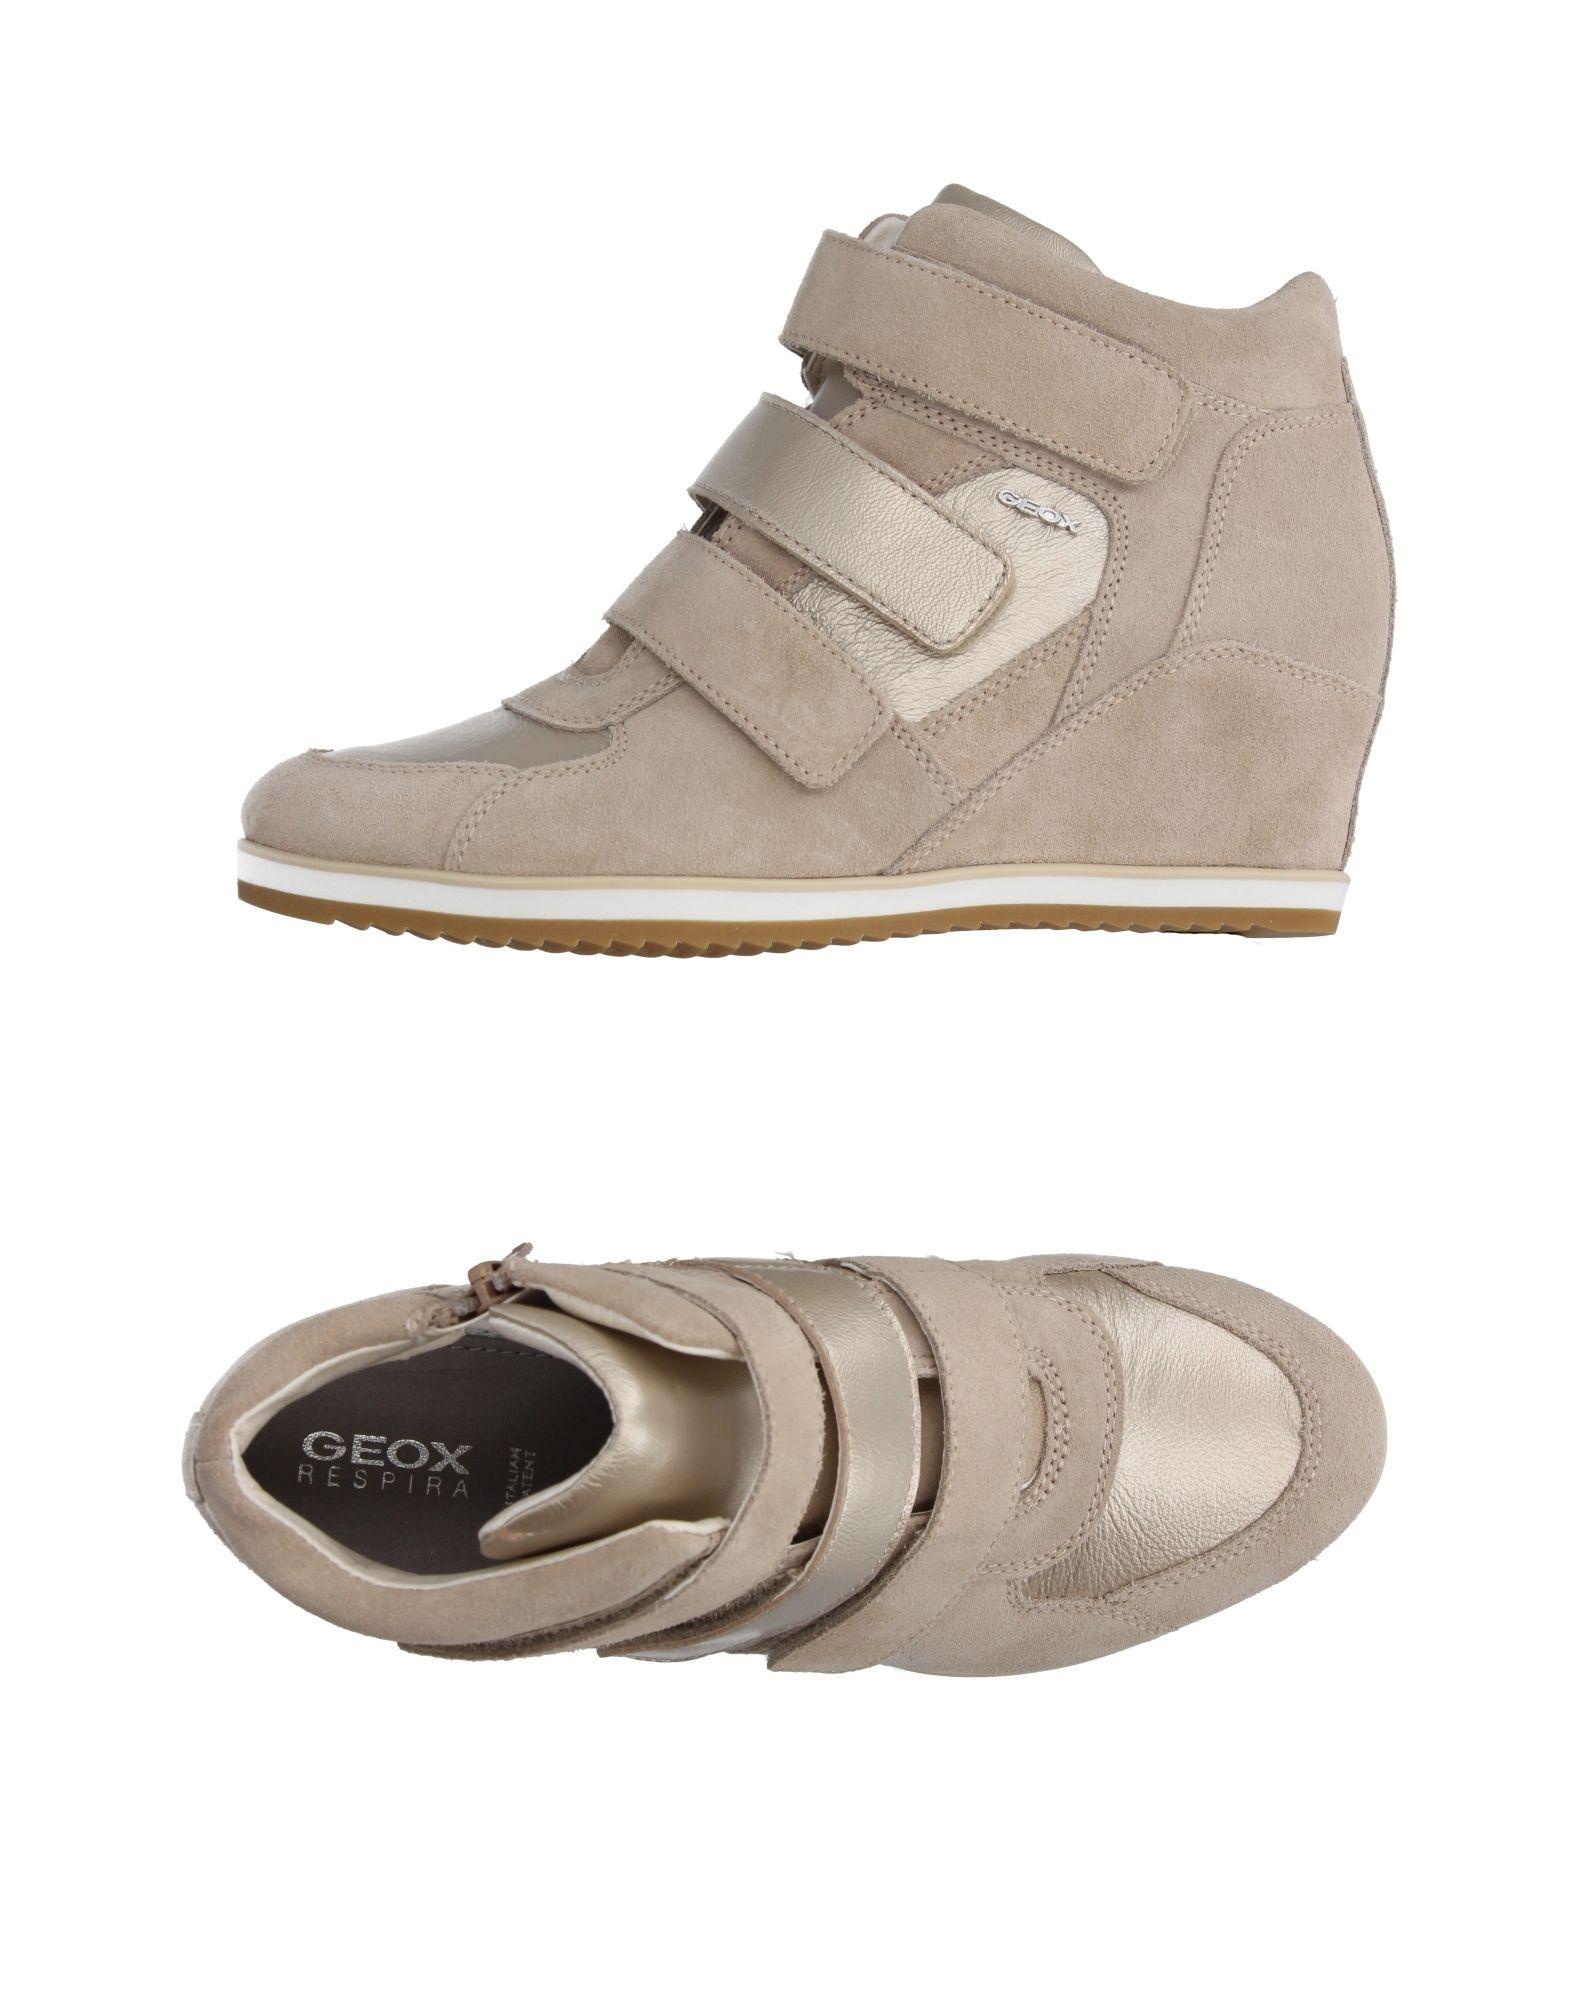 Moda Sneakers Geox Donna - 11217026AJ